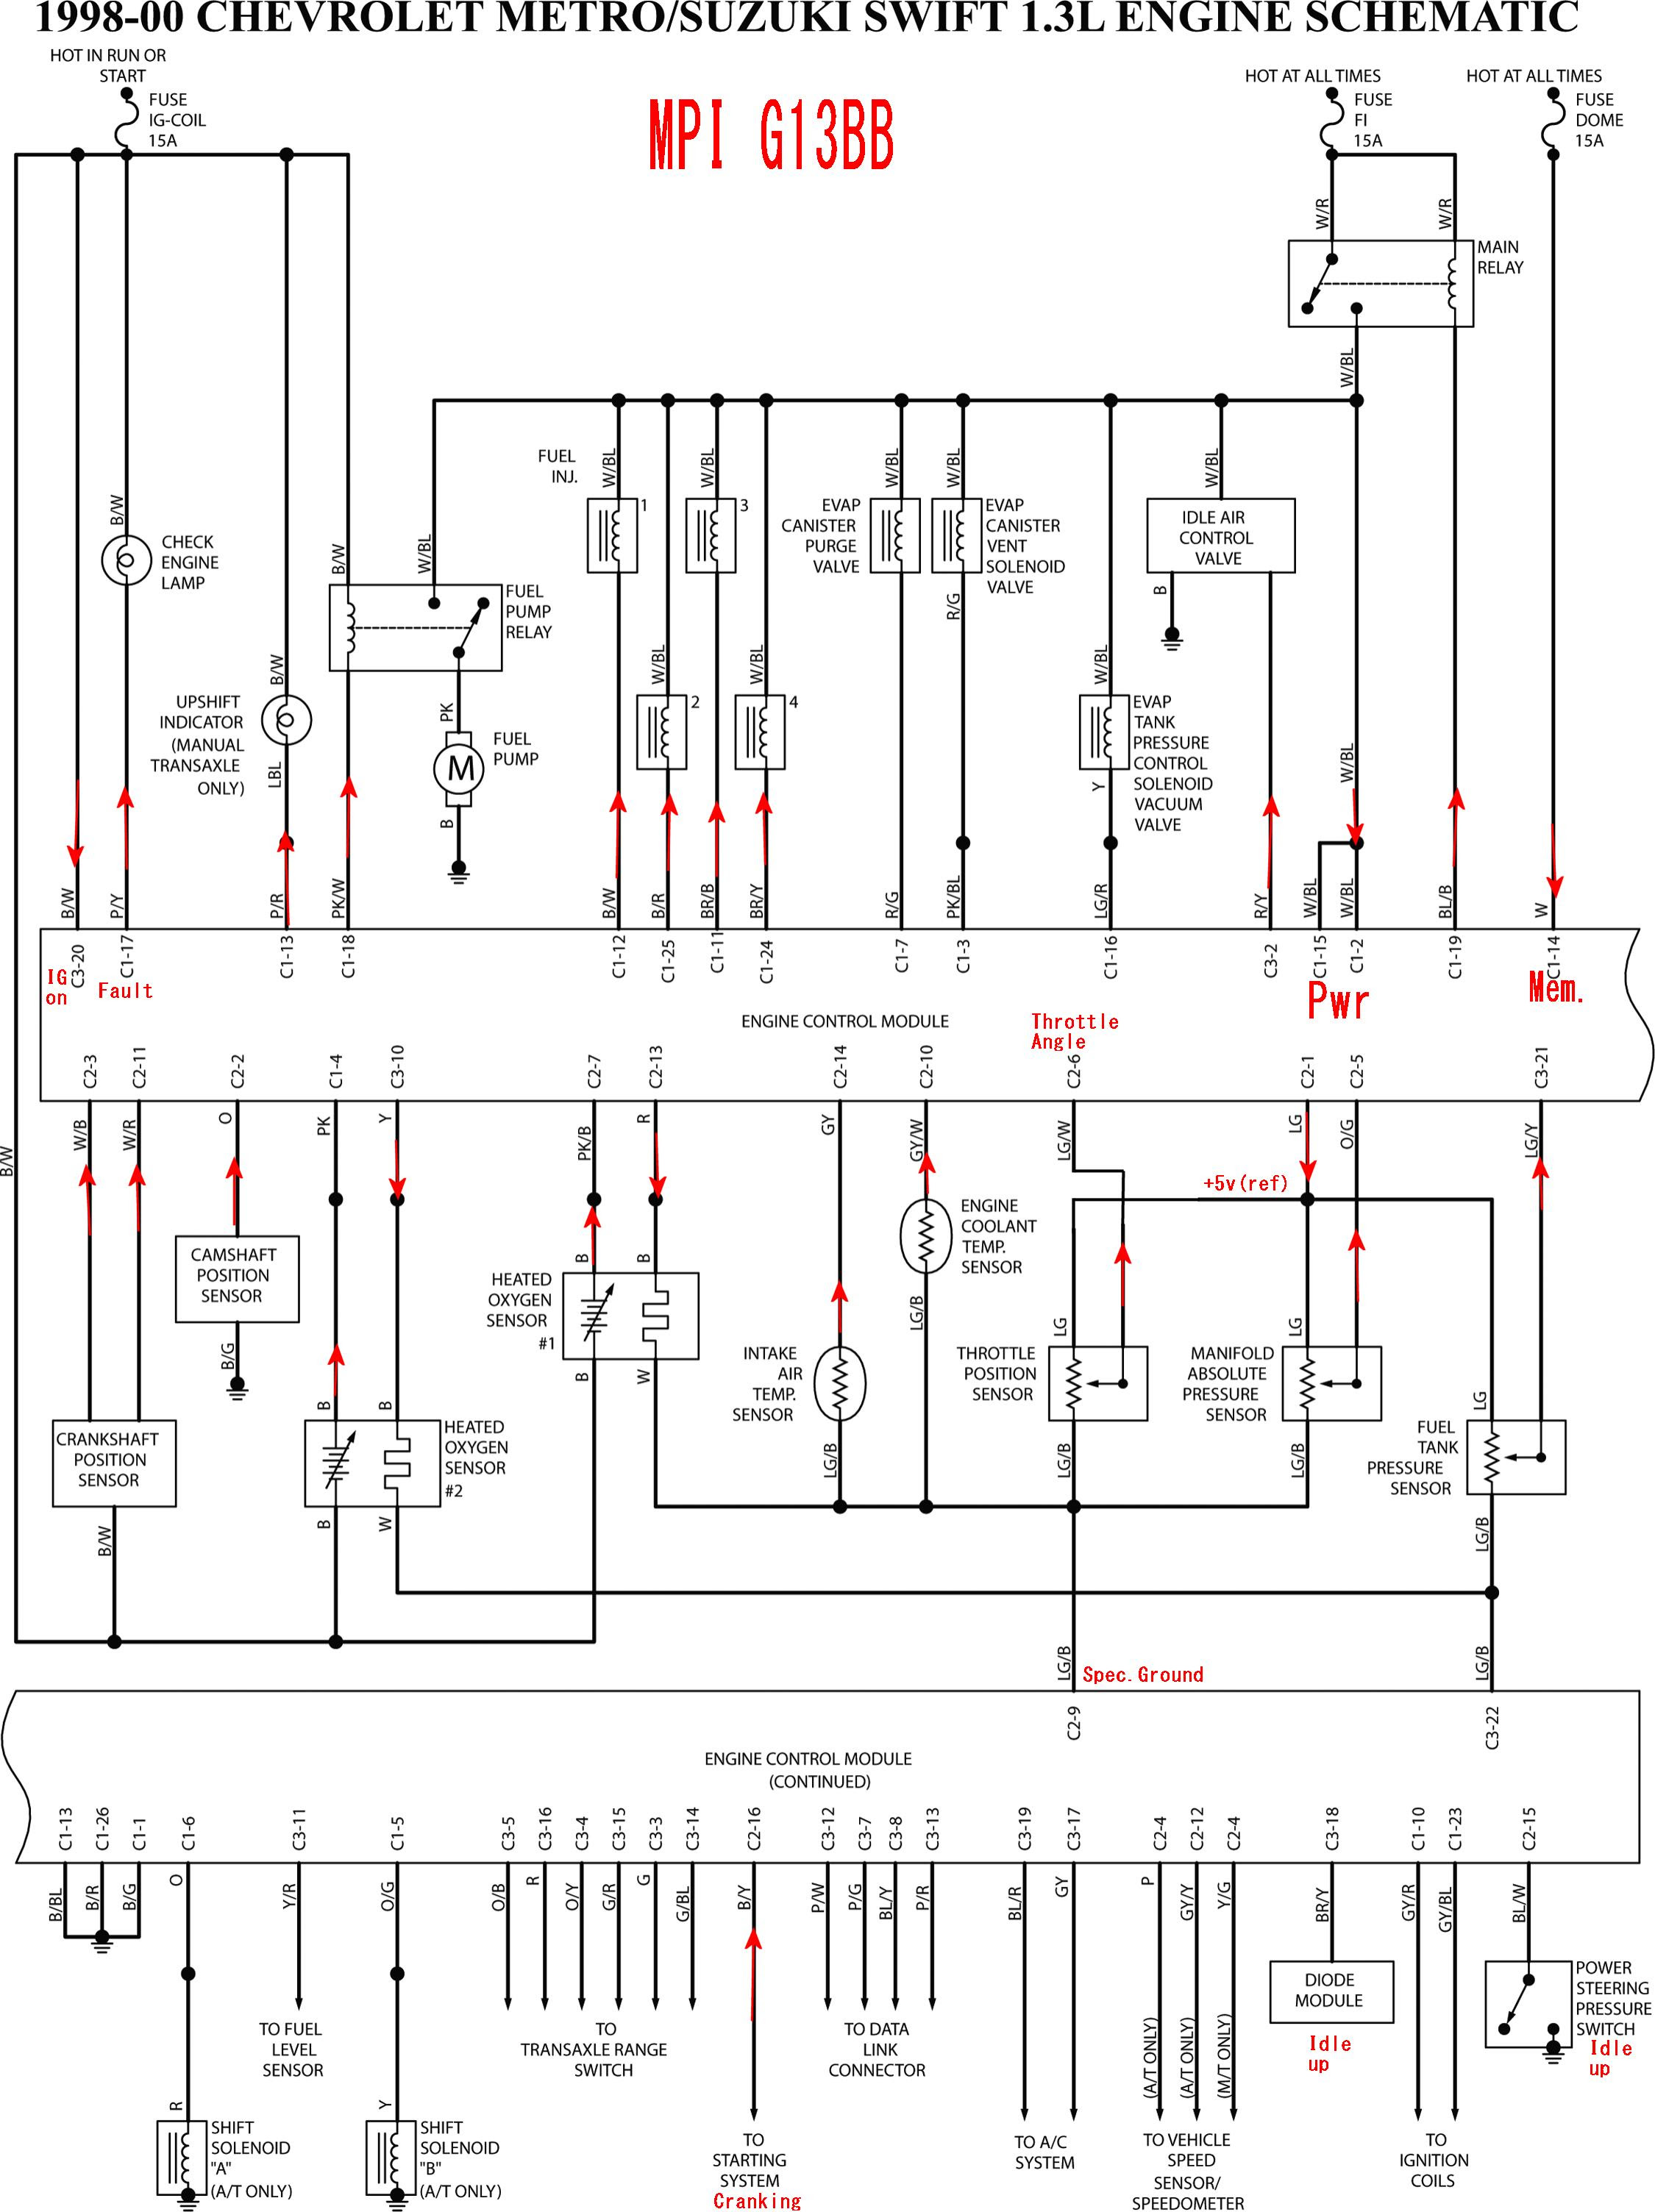 72f973 1993 Geo Prizm Fuse Diagram Wiring Resources